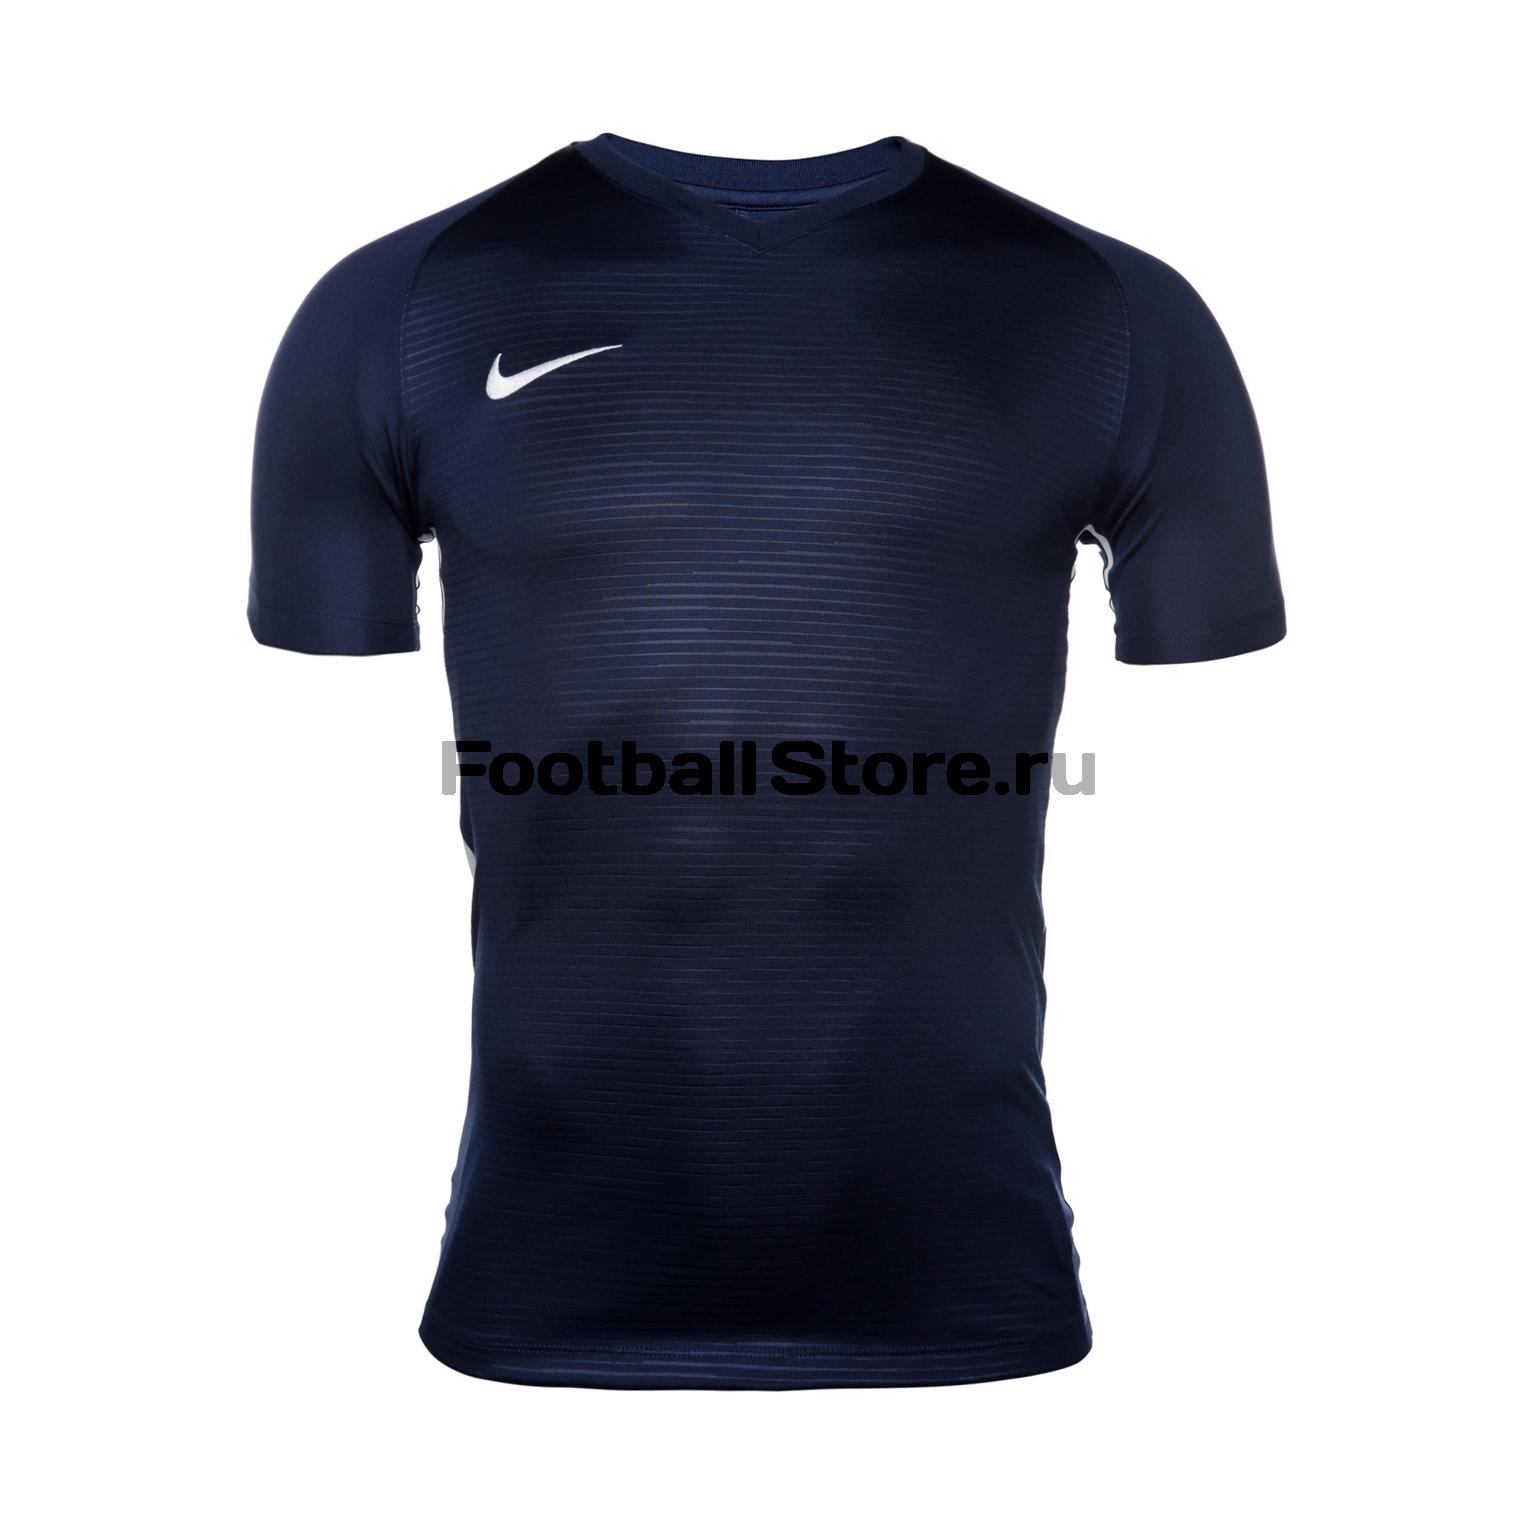 Футболка игровая Nike Dry Tiempo Prem JSY SS 894230-411 футболки nike футболка игровая nike ss revolution iv jsy 833017 010